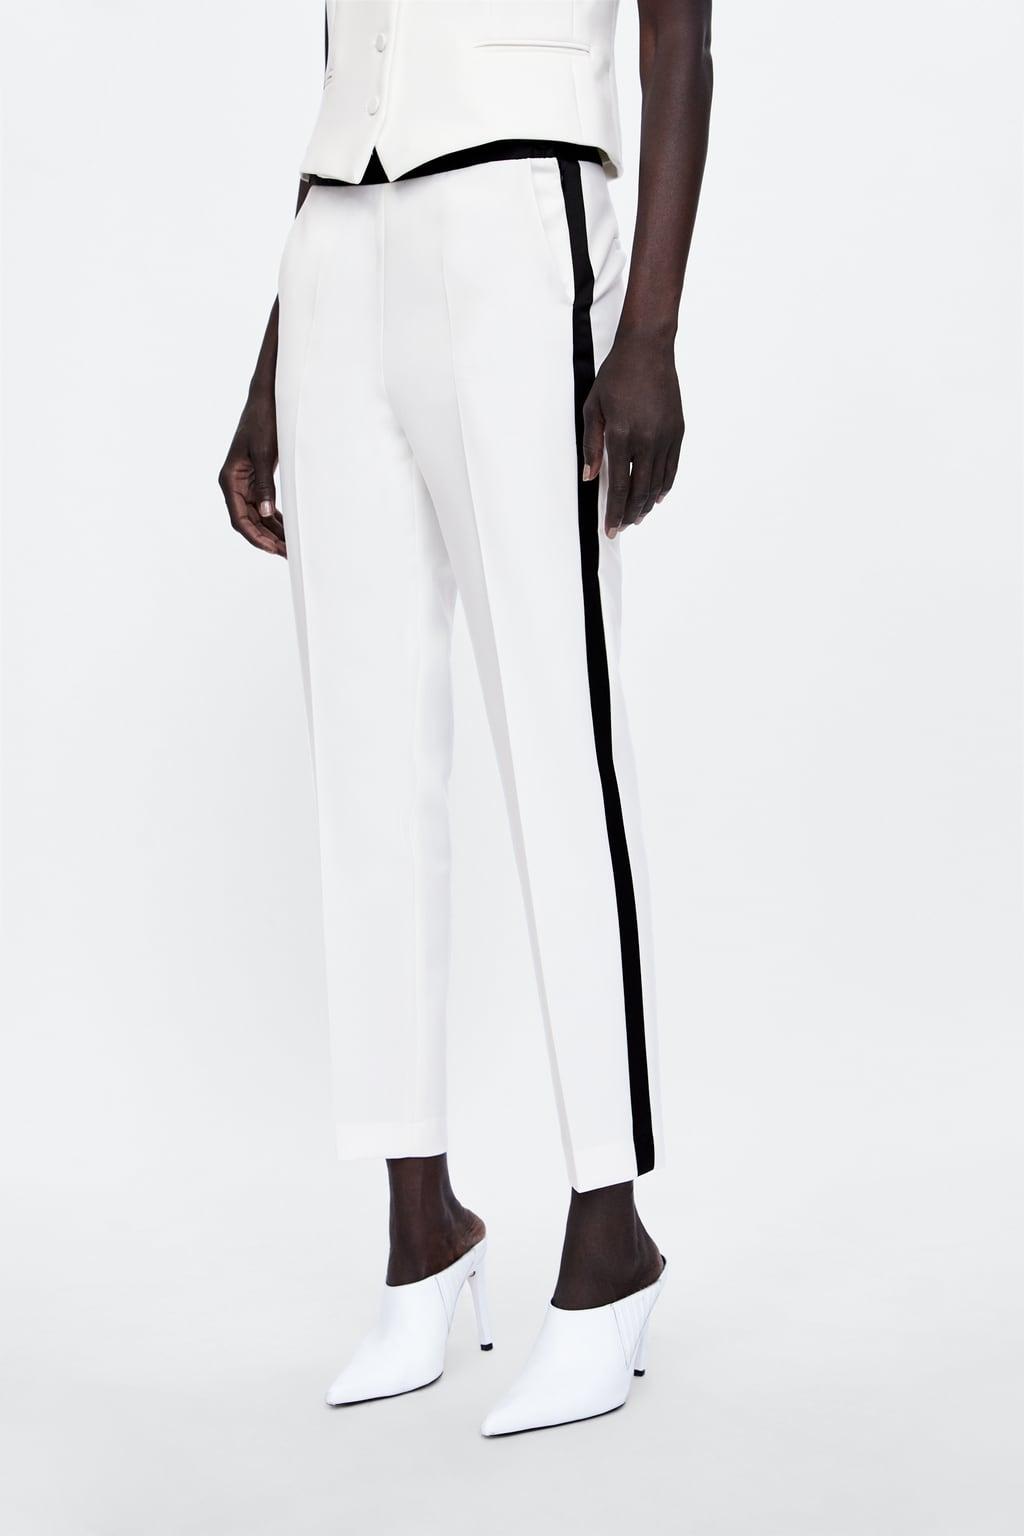 Zara, Trousers, £29.99